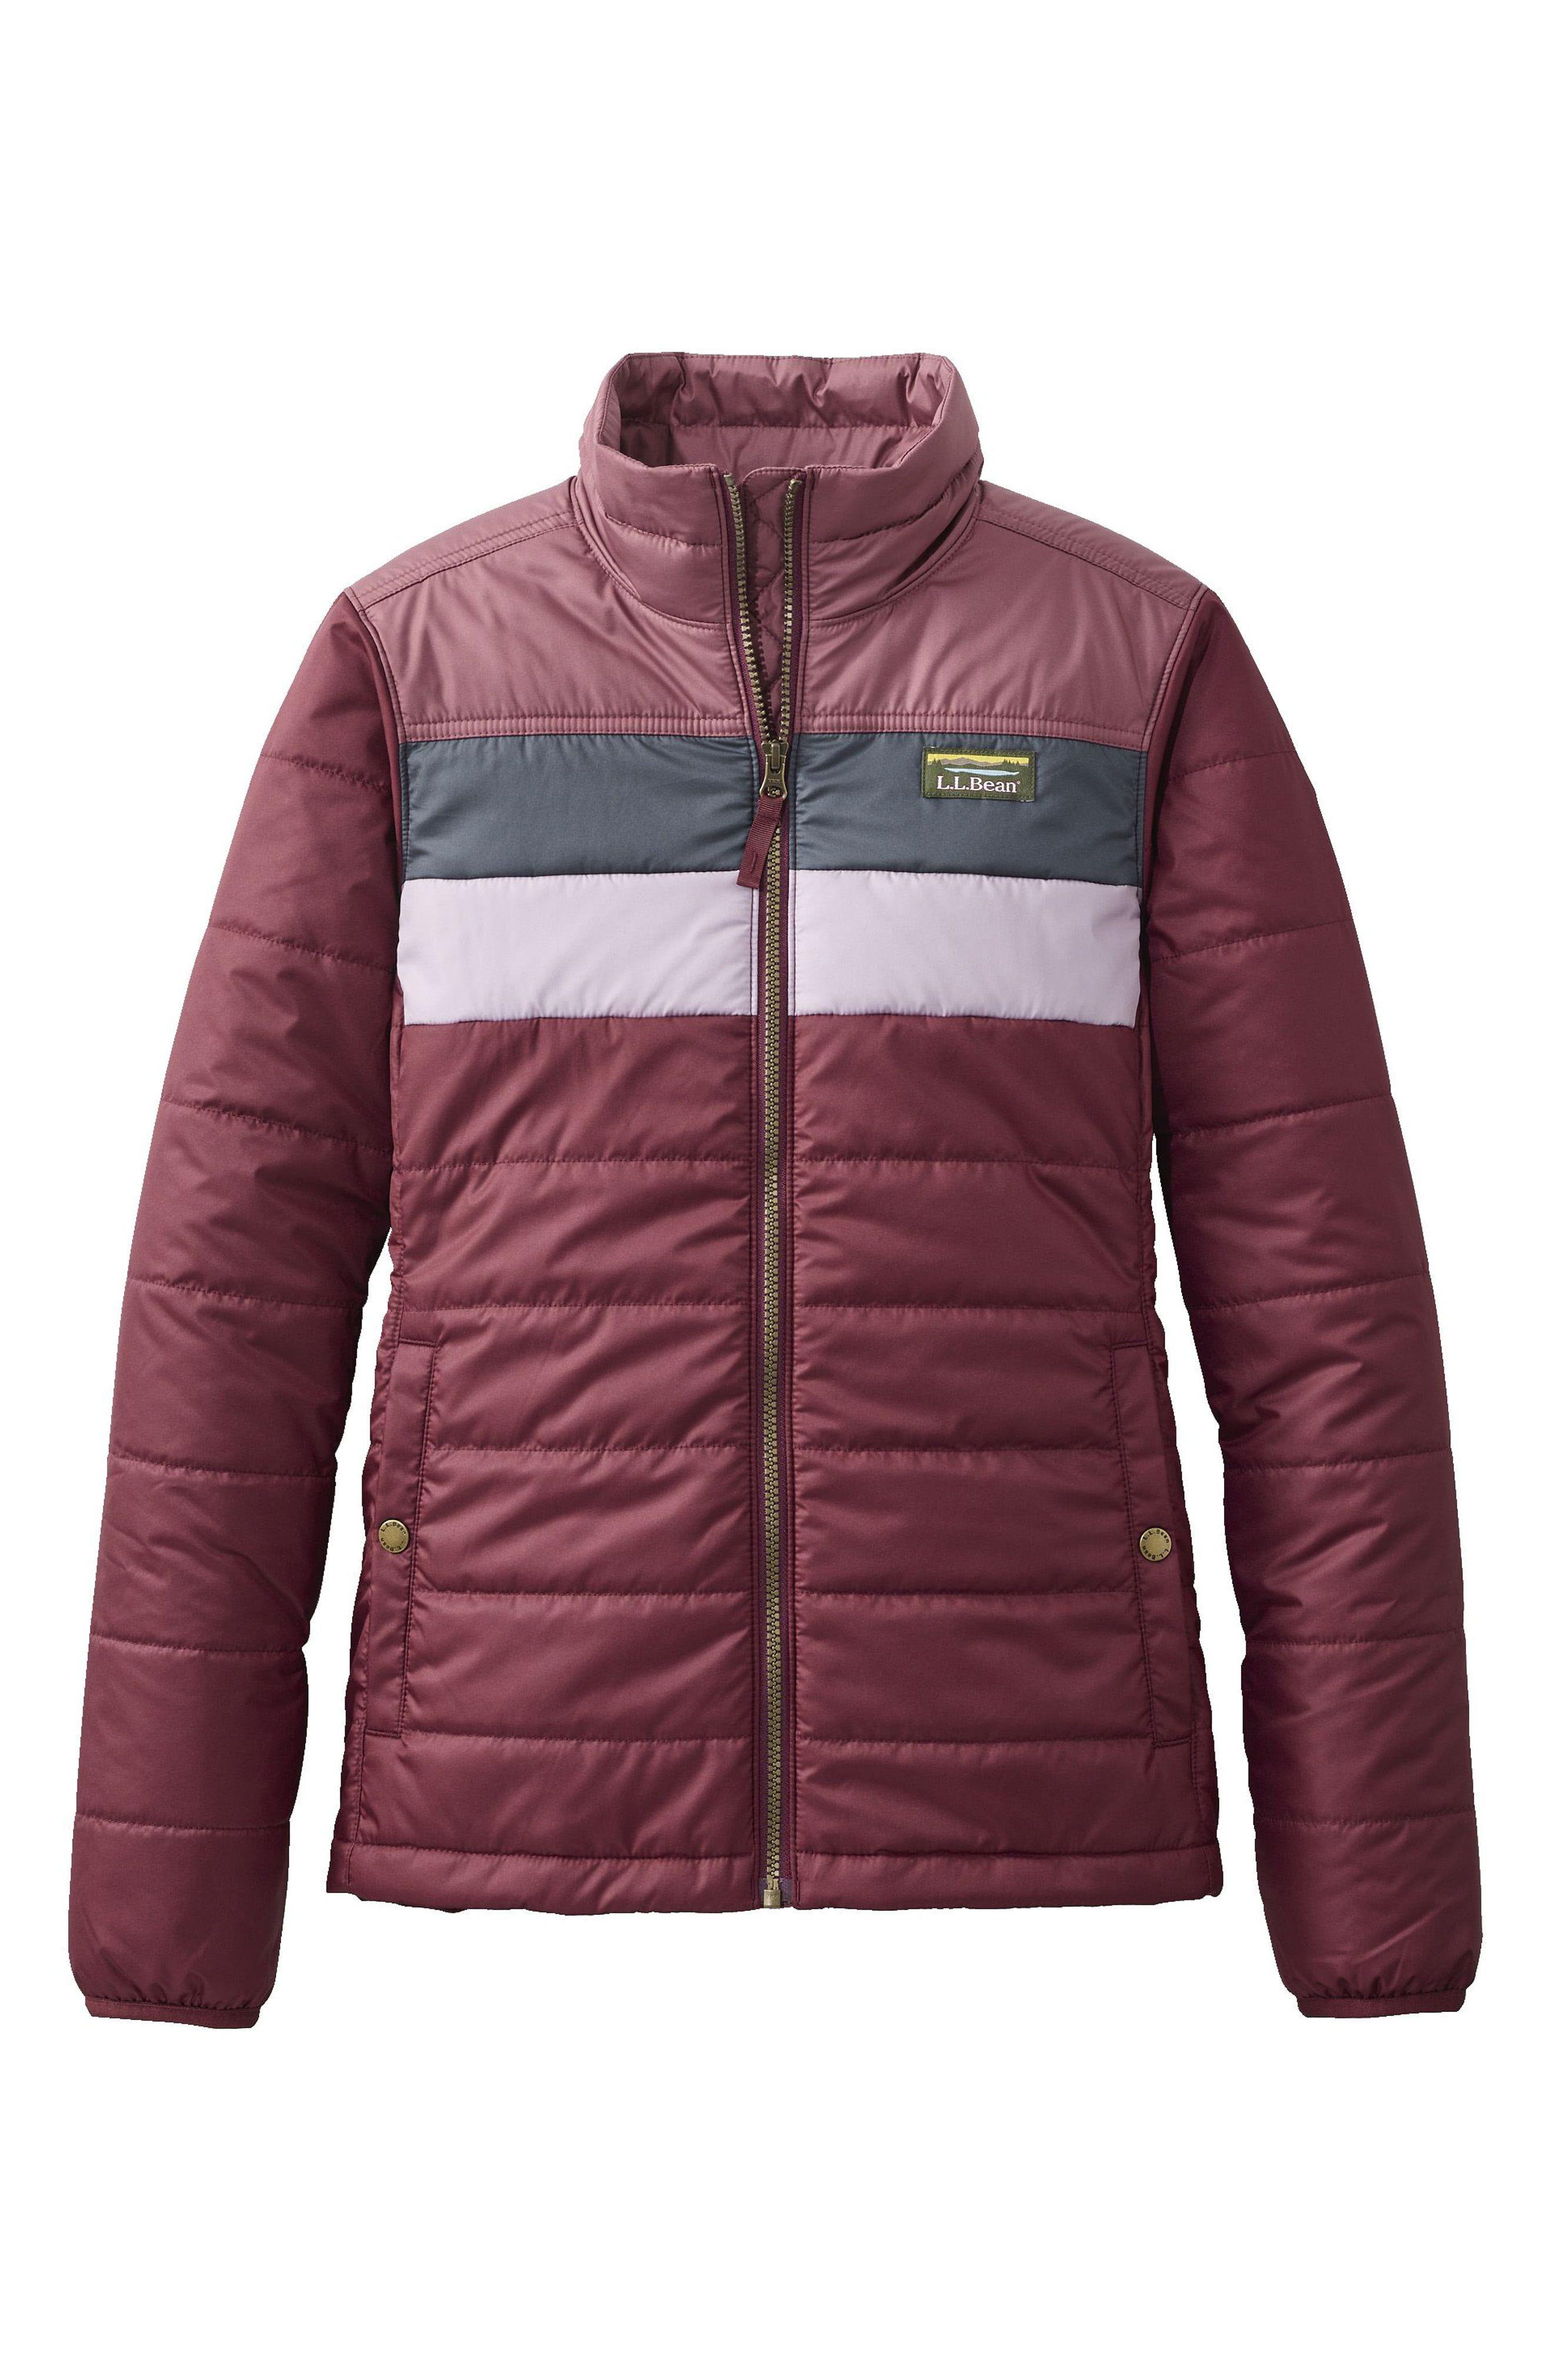 L L Bean Women S Mountain Classic Water Repellent Puffer Jacket Nordstrom In 2021 Jackets Outerwear Women Puffer Jackets [ 4048 x 2640 Pixel ]